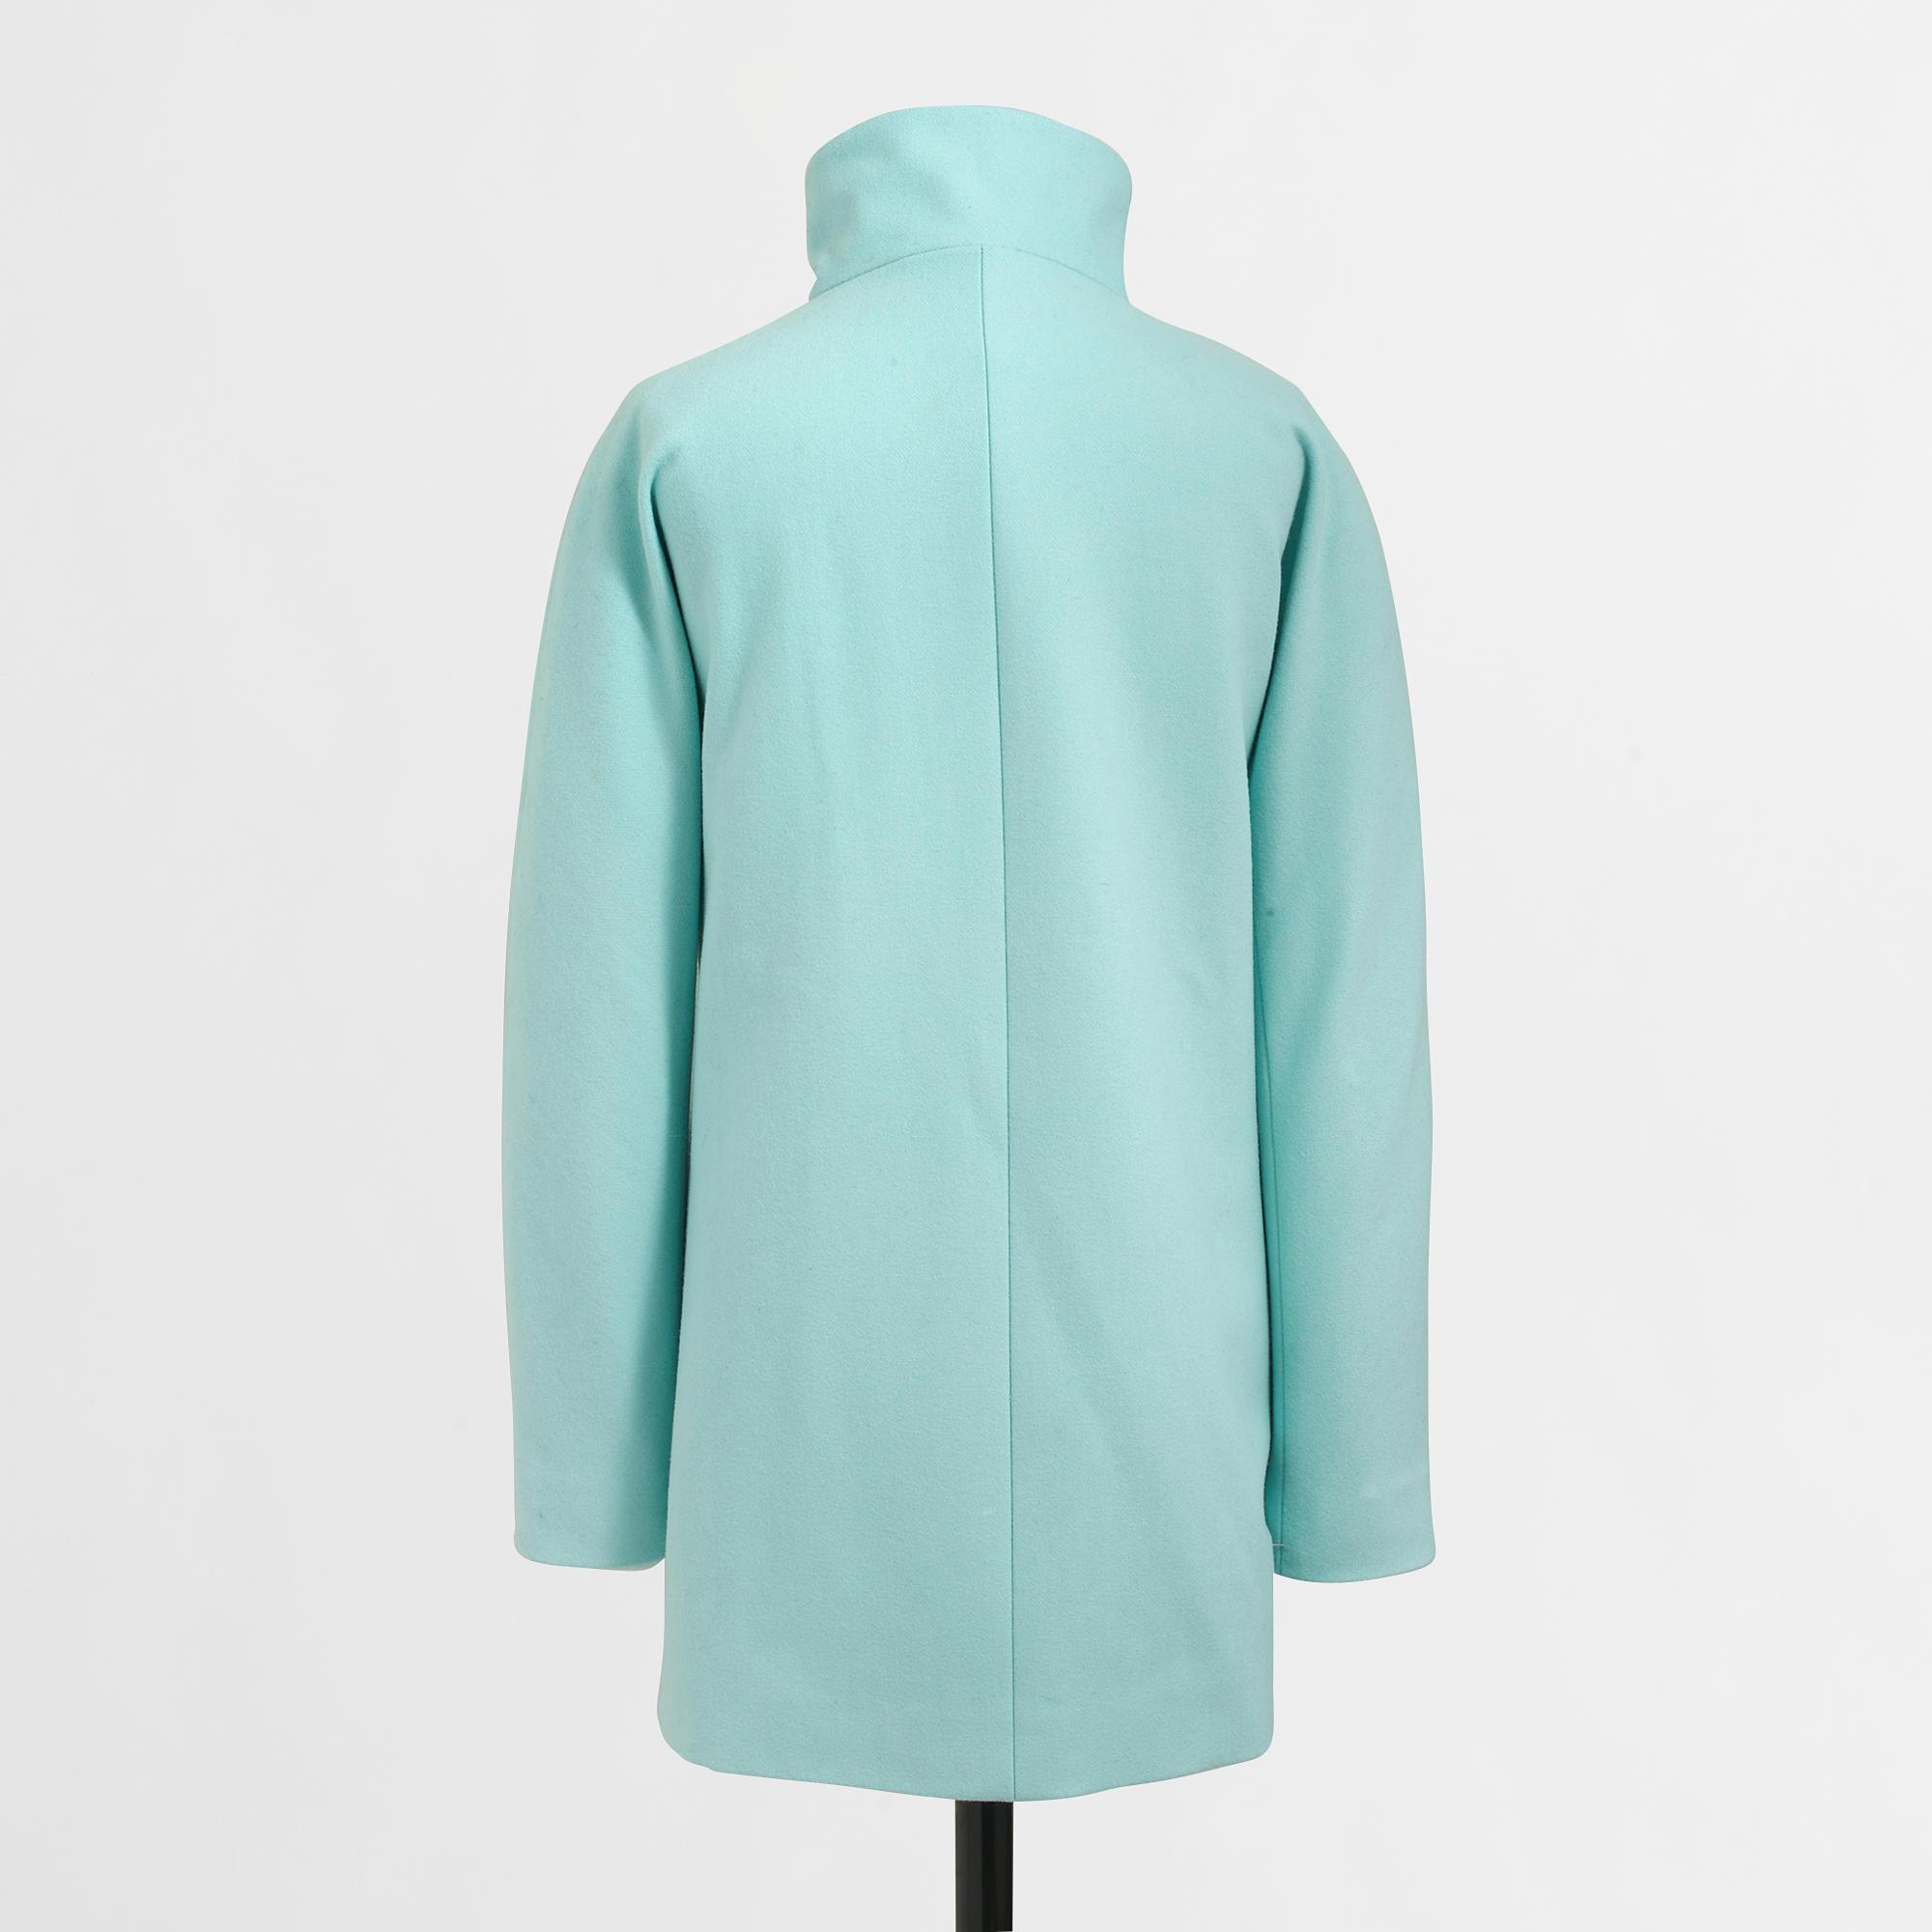 J crew womens green coat